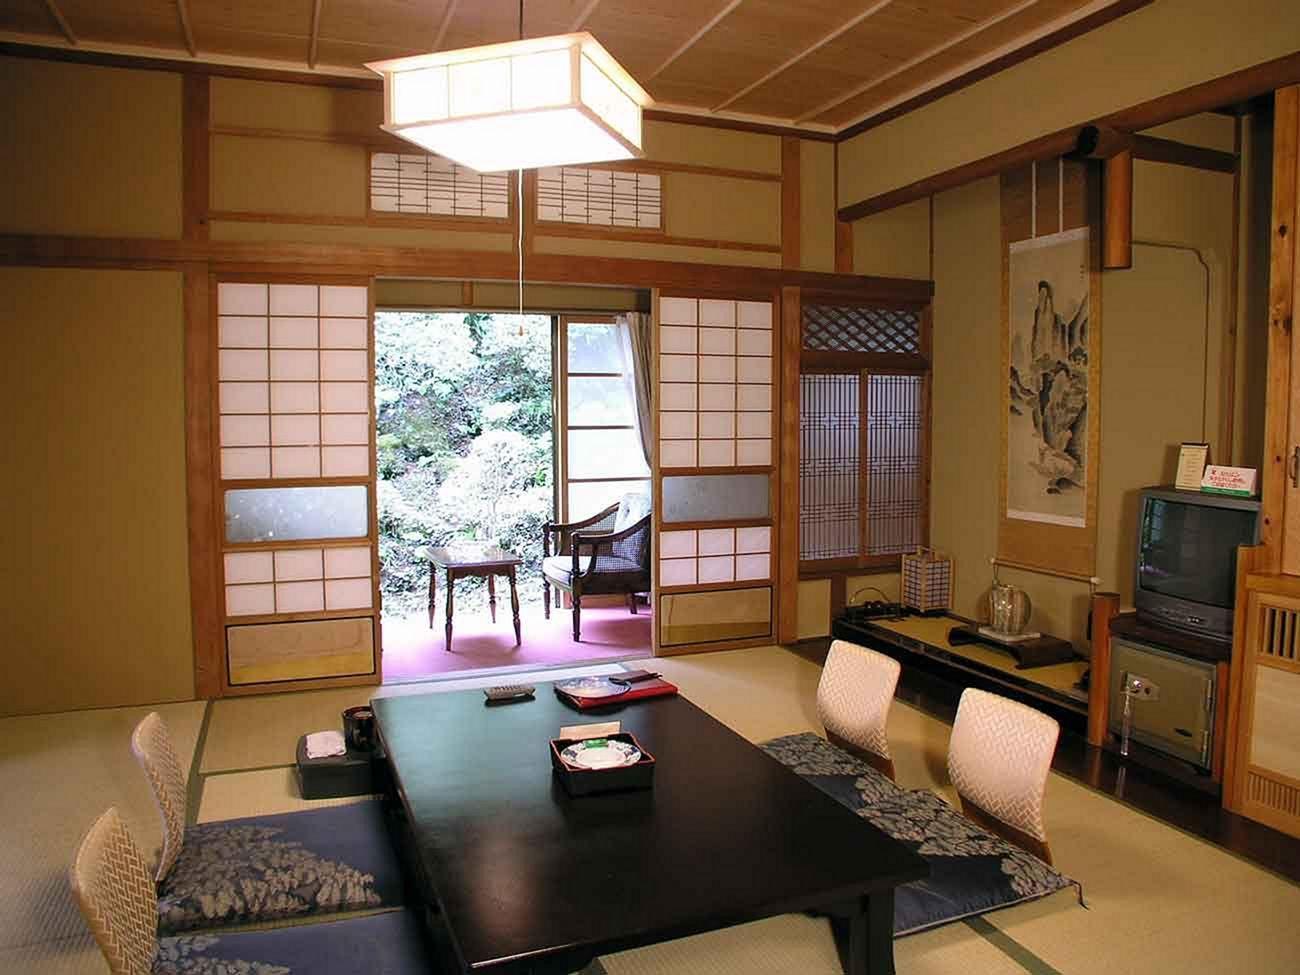 21 Japanese Kitchen Design That Makes You Amazed Freshouz Com Japanese Living Rooms Japanese Living Room Decor Living Room Japanese Style